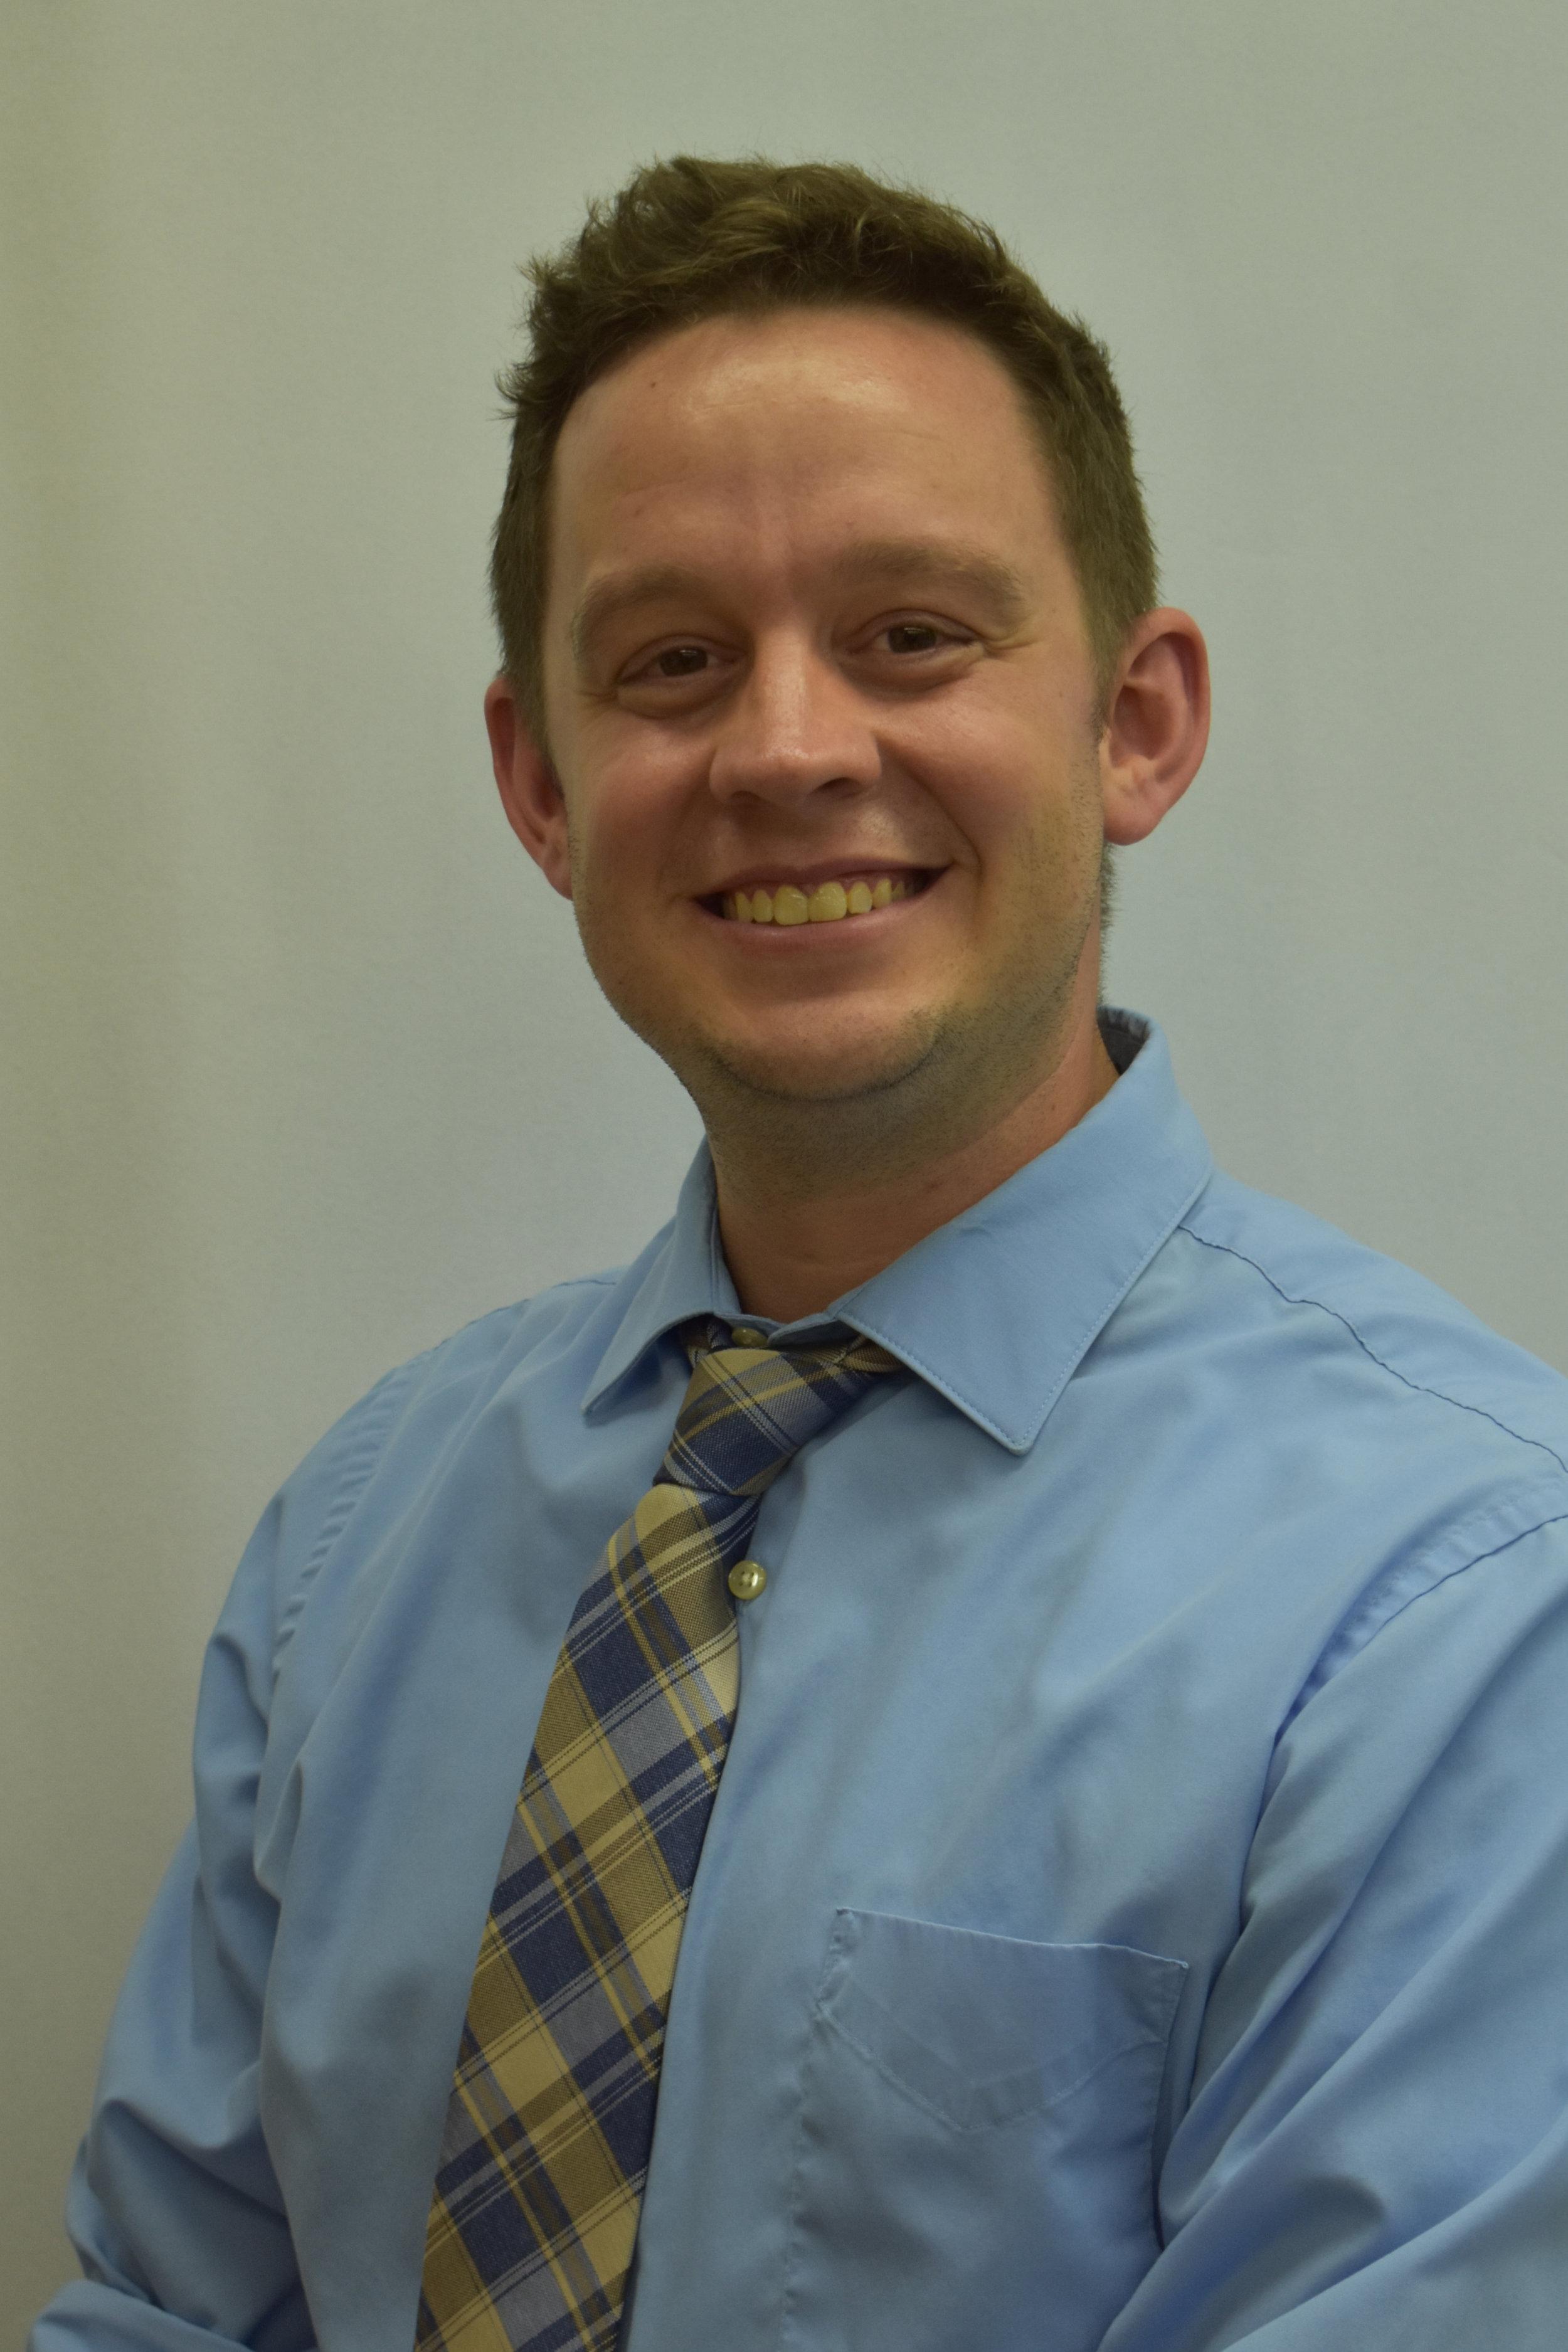 Mr. Aaron Fitzpatrick | Adviser